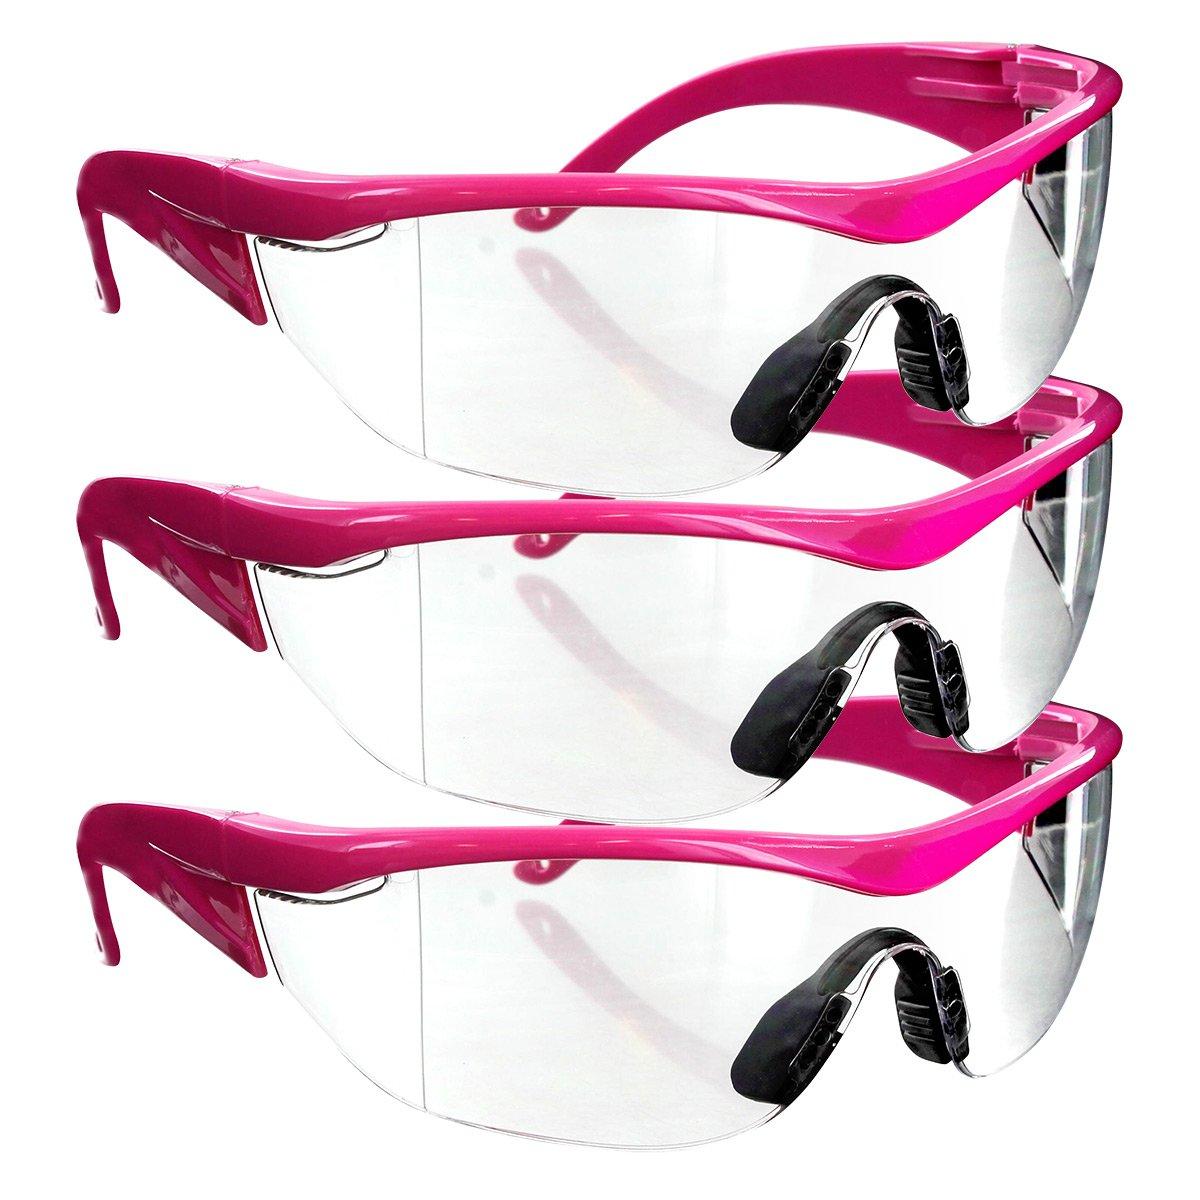 Safety Girl Navigator Safety Glasses (3 Pair-Pink Frame-Clear Lense)